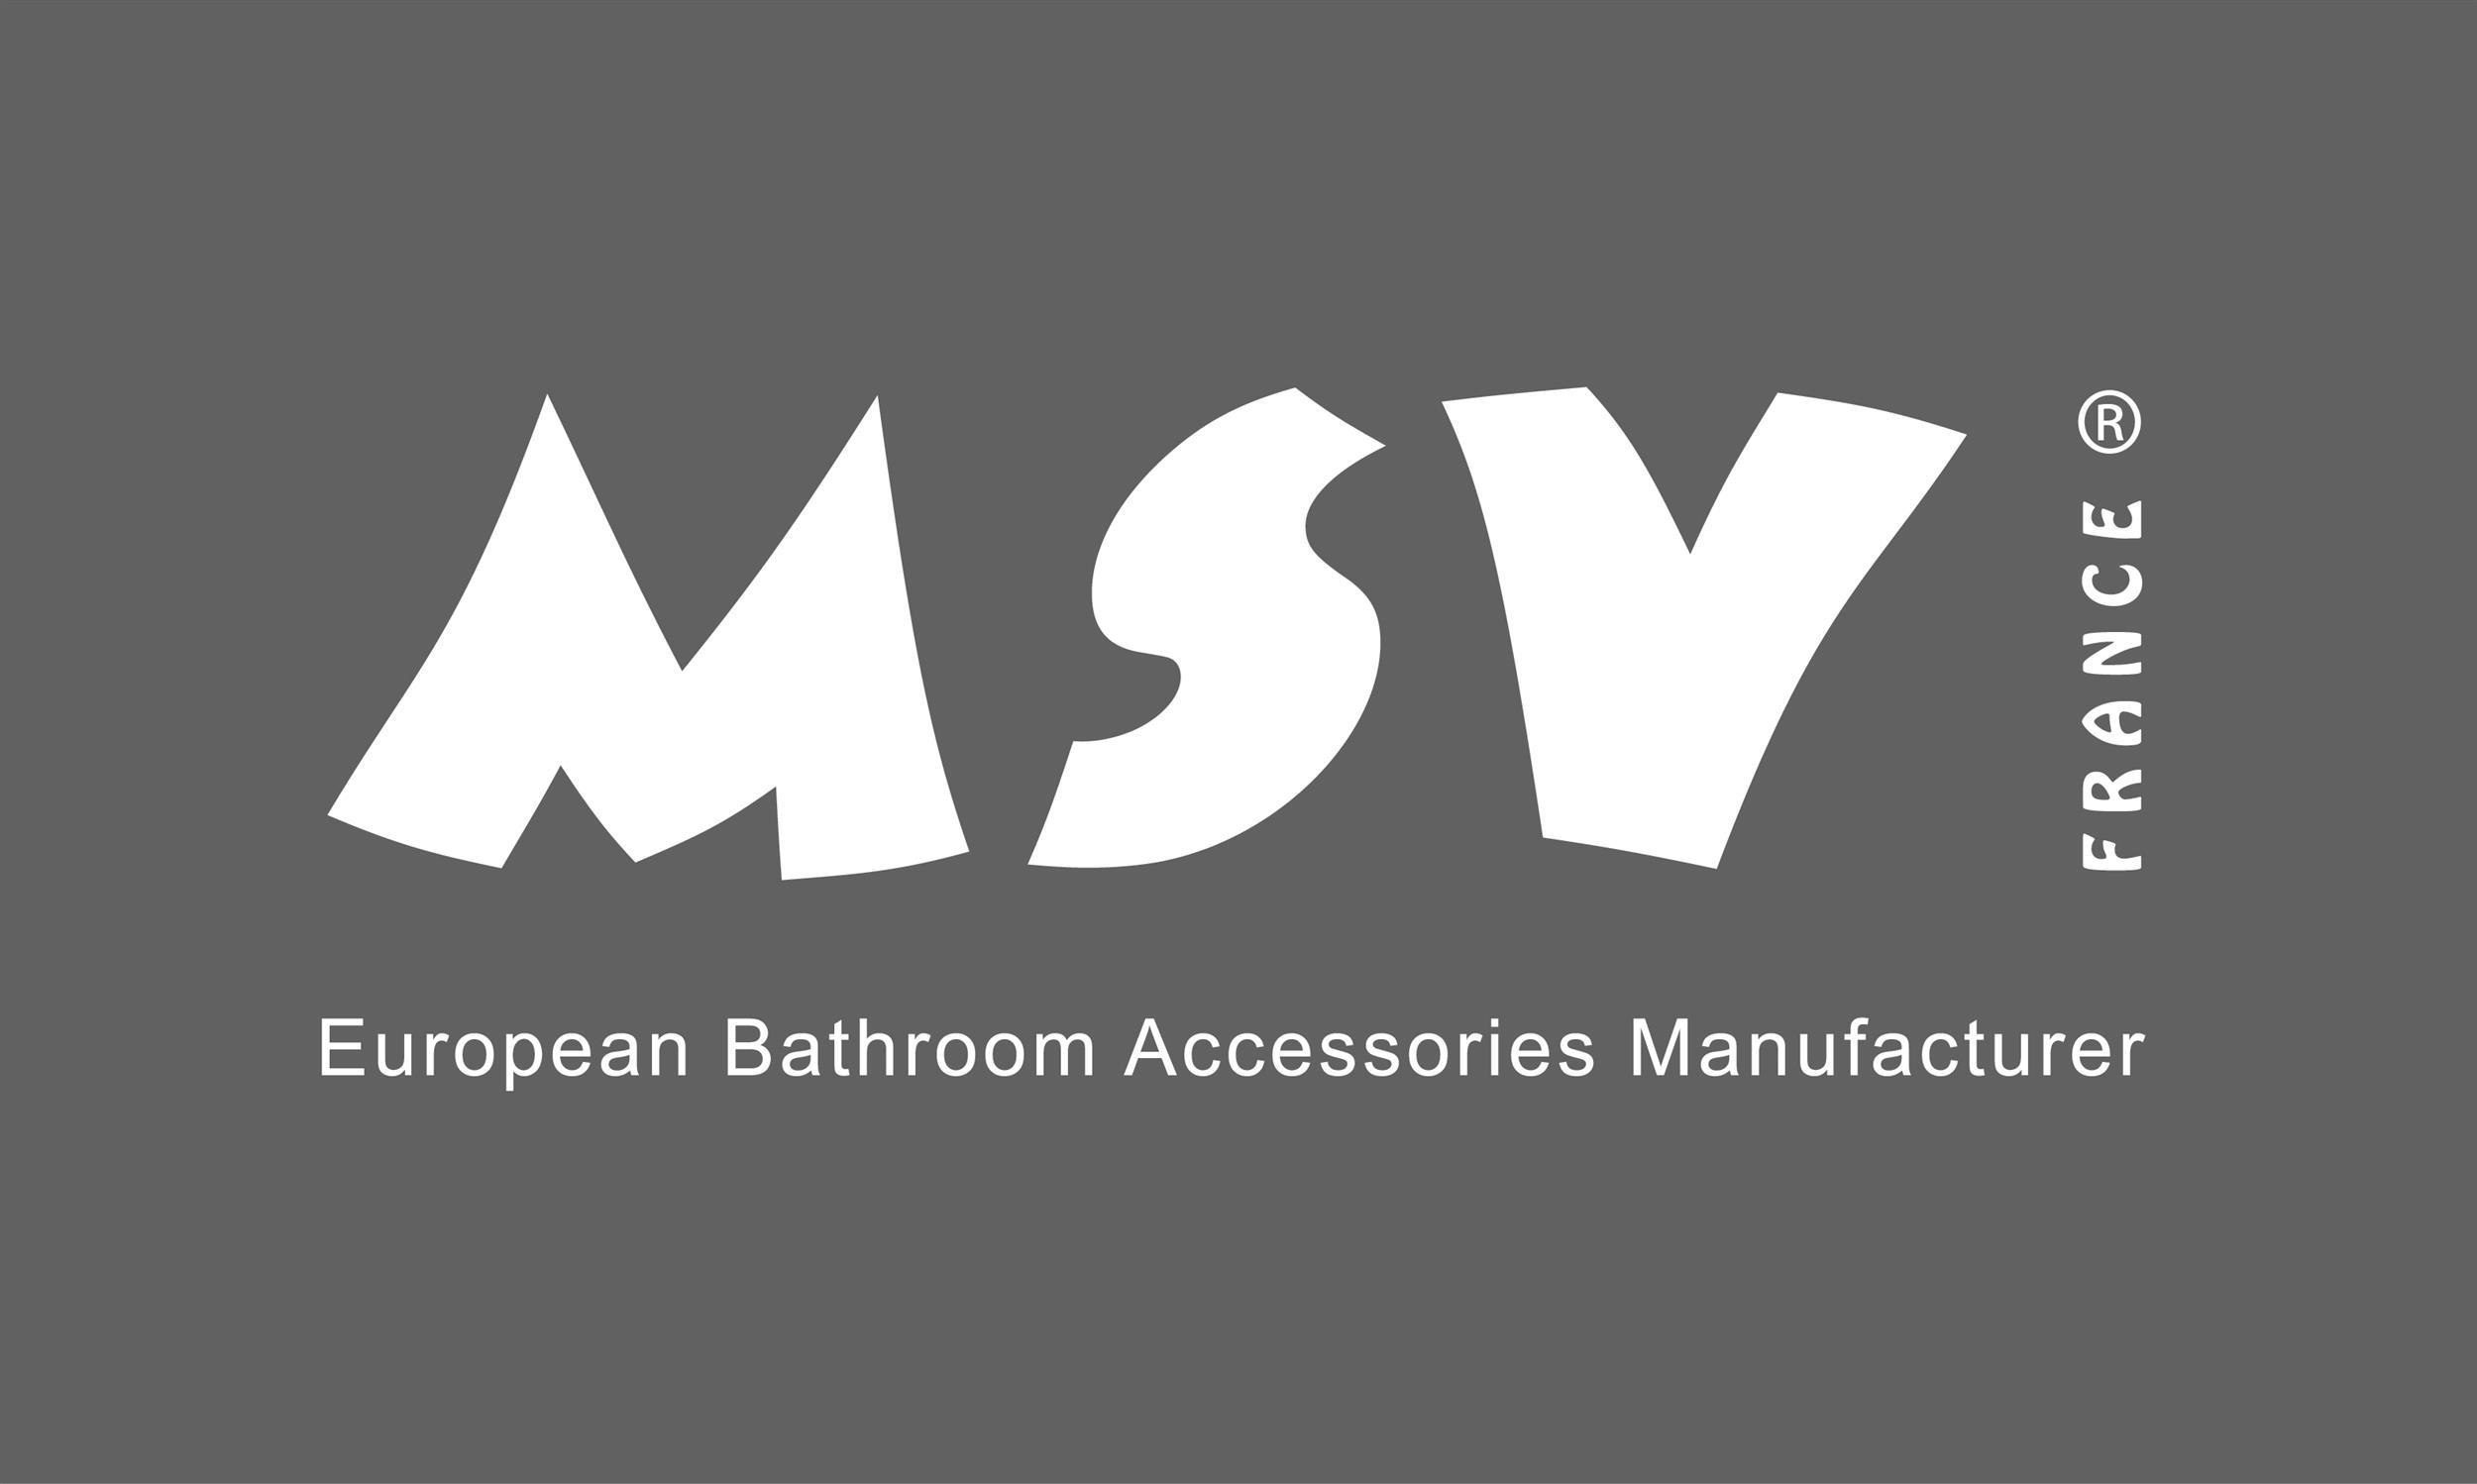 MSV Duschvorhang 180x200cm Anti Schimmel Textil Badewannenvorhang Wannenvorhang